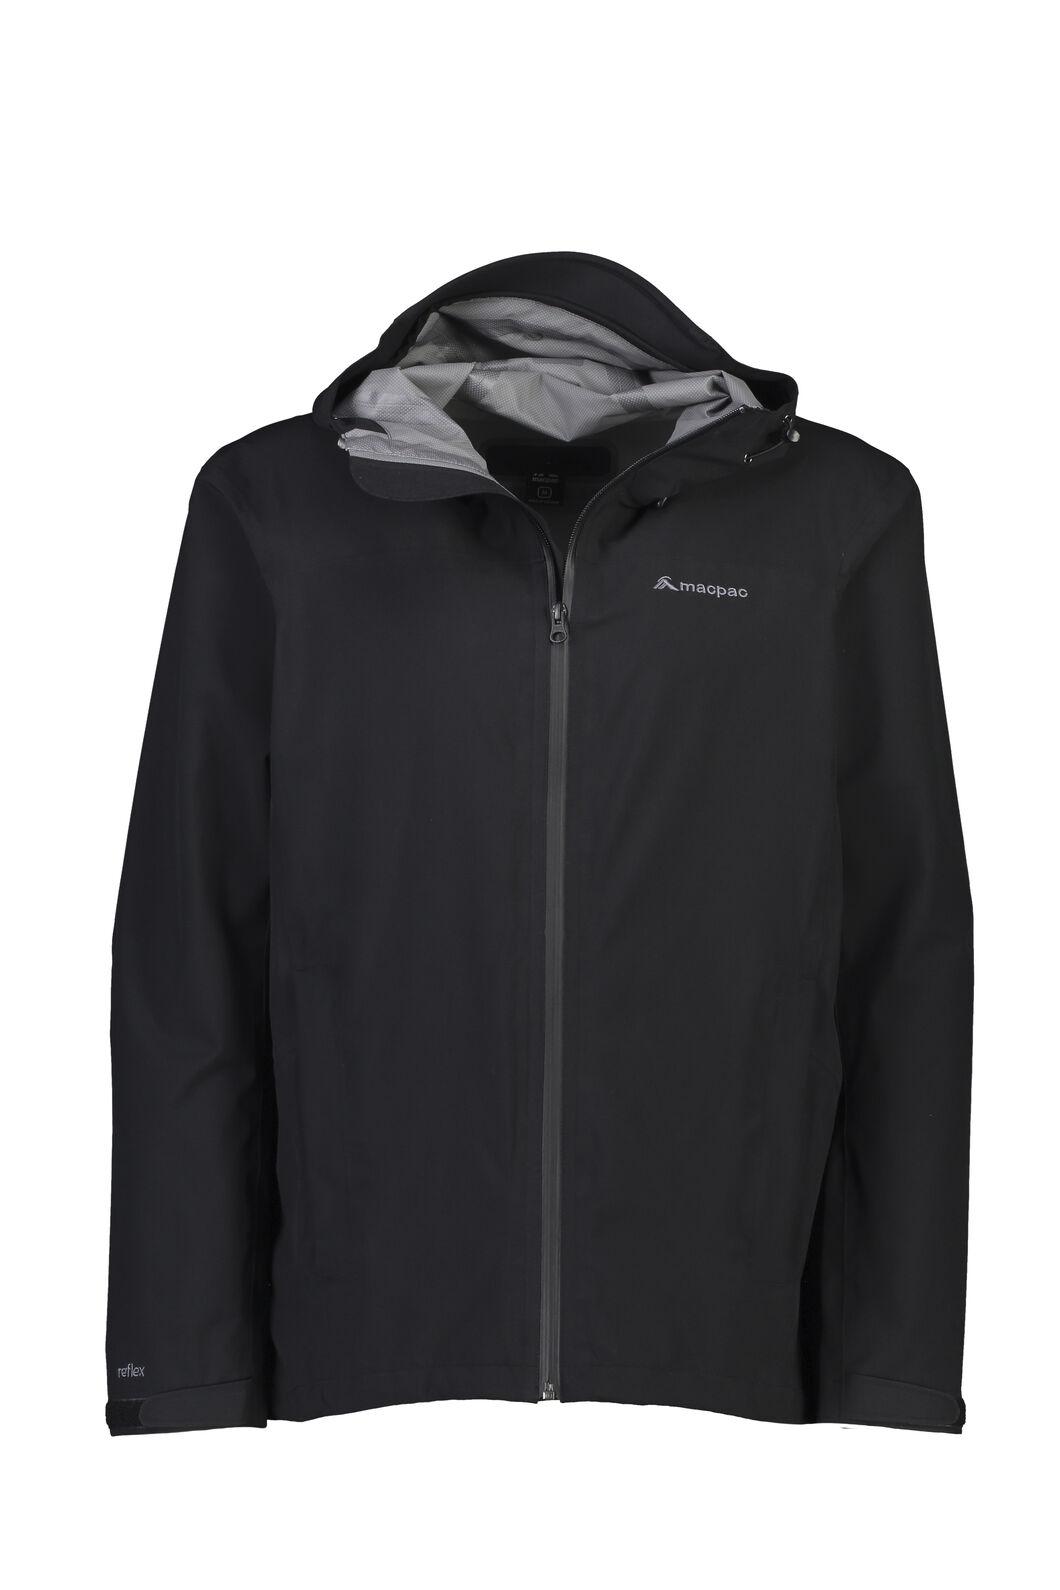 Macpac Men's Dispatch Rain Jacket, Black, hi-res